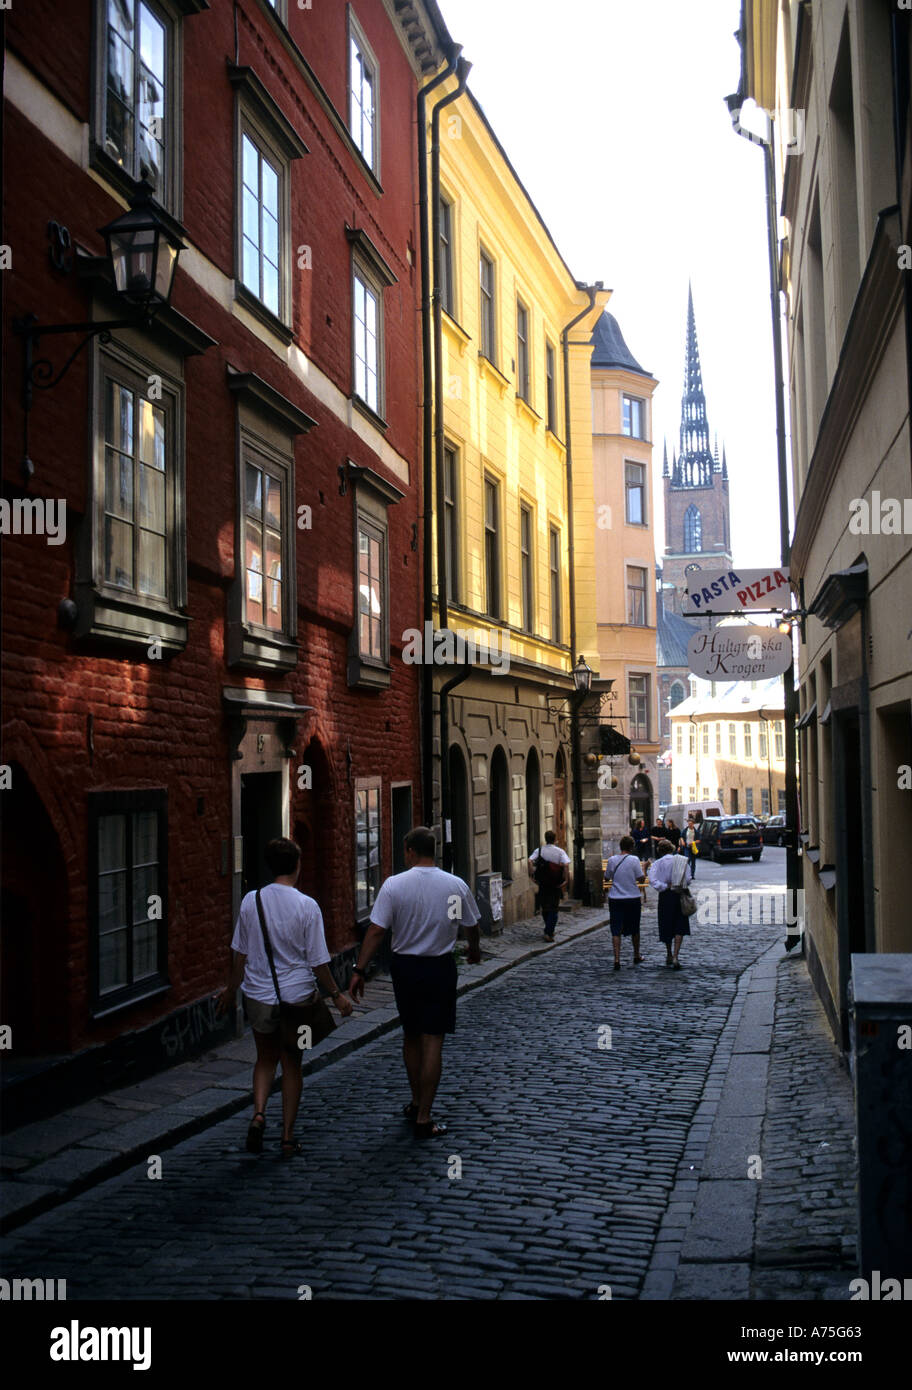 A Street in GAMAL STAN STOCKHOLM SWEDEN - Stock Image